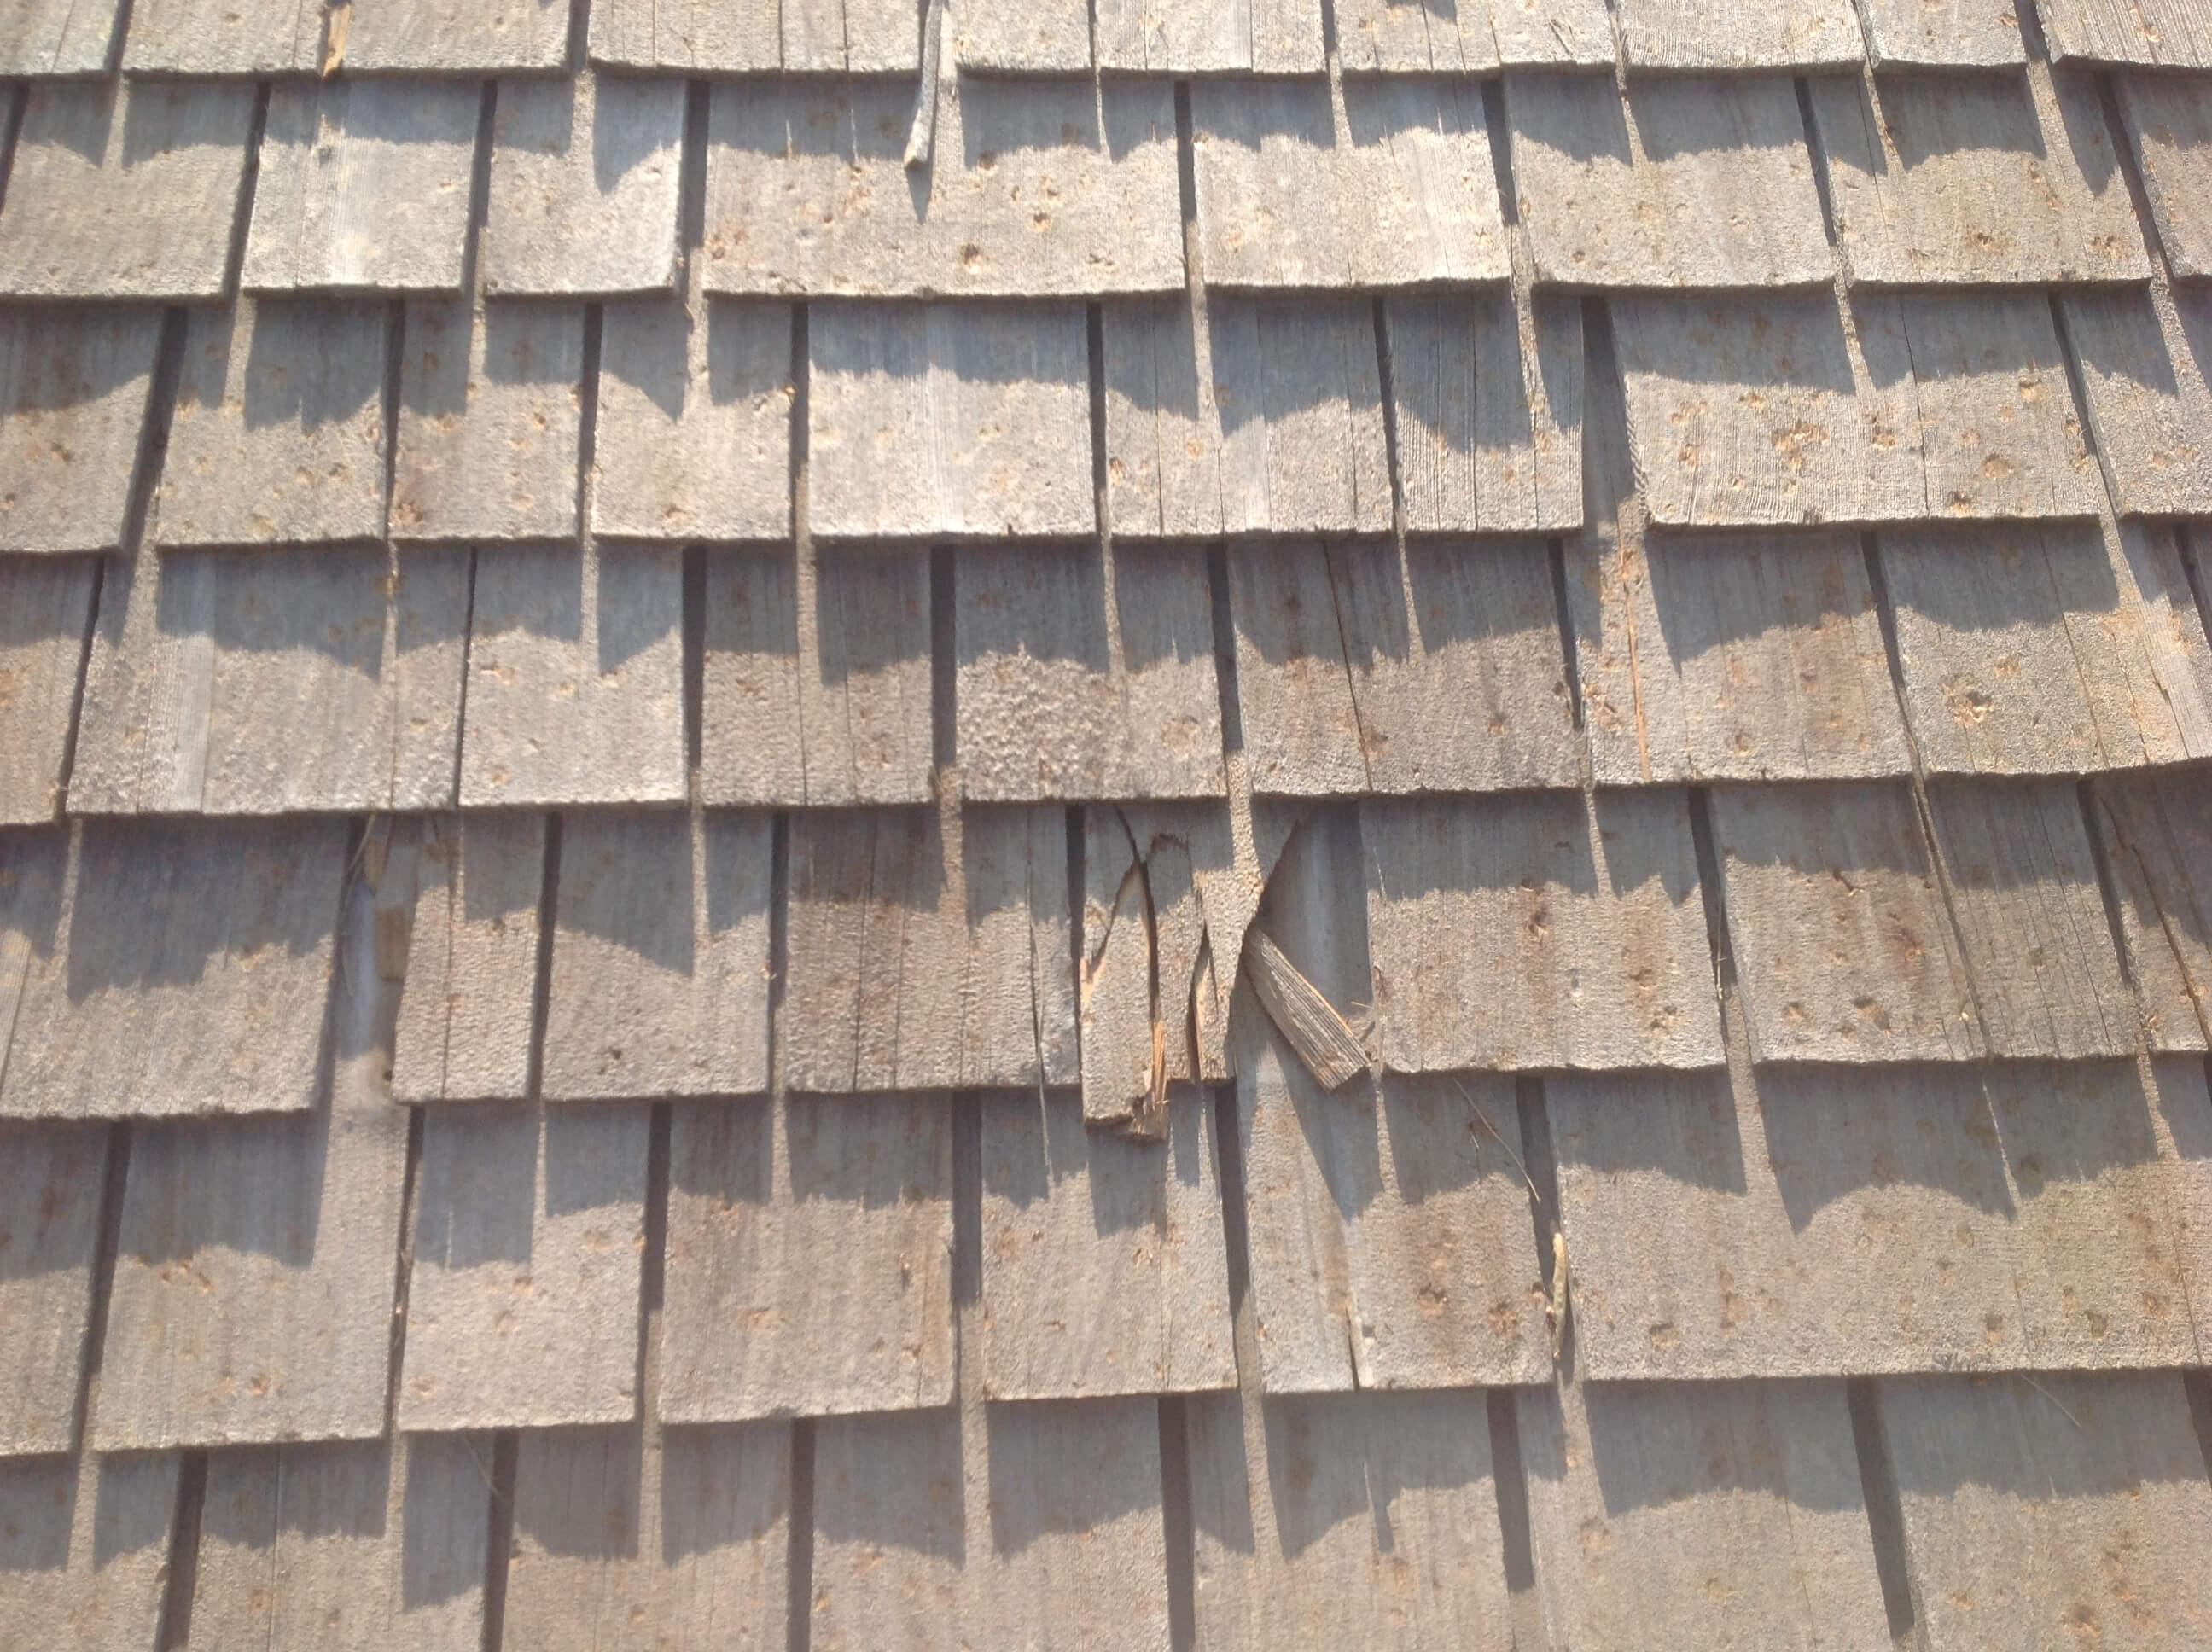 Cedar Shake Roof Damage